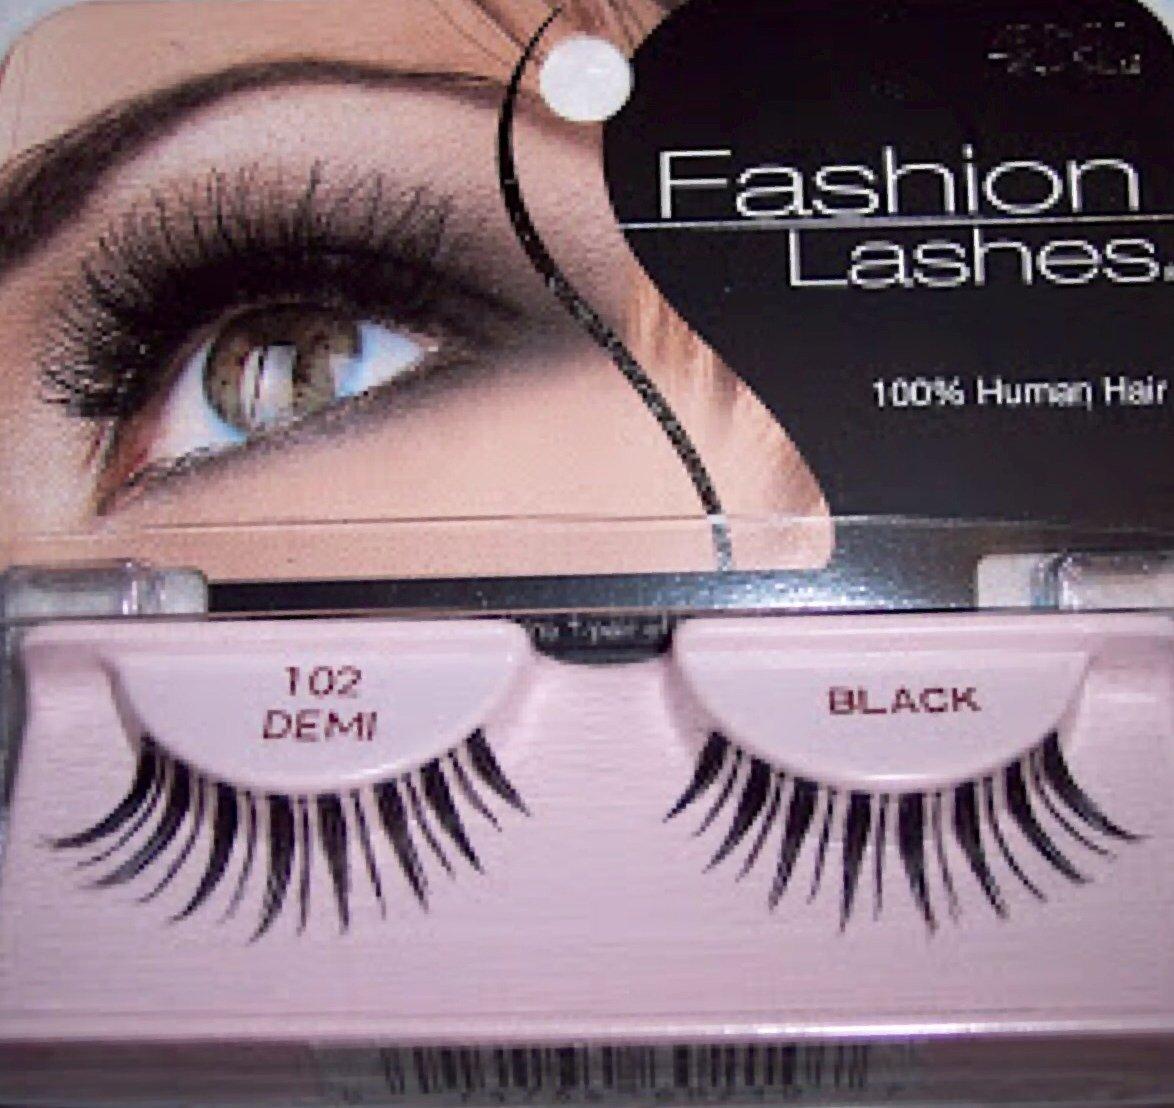 f156966240b Amazon.com : Ardell Fashion Lashes, 102 Demi Black, (Pack of 3) : Beauty